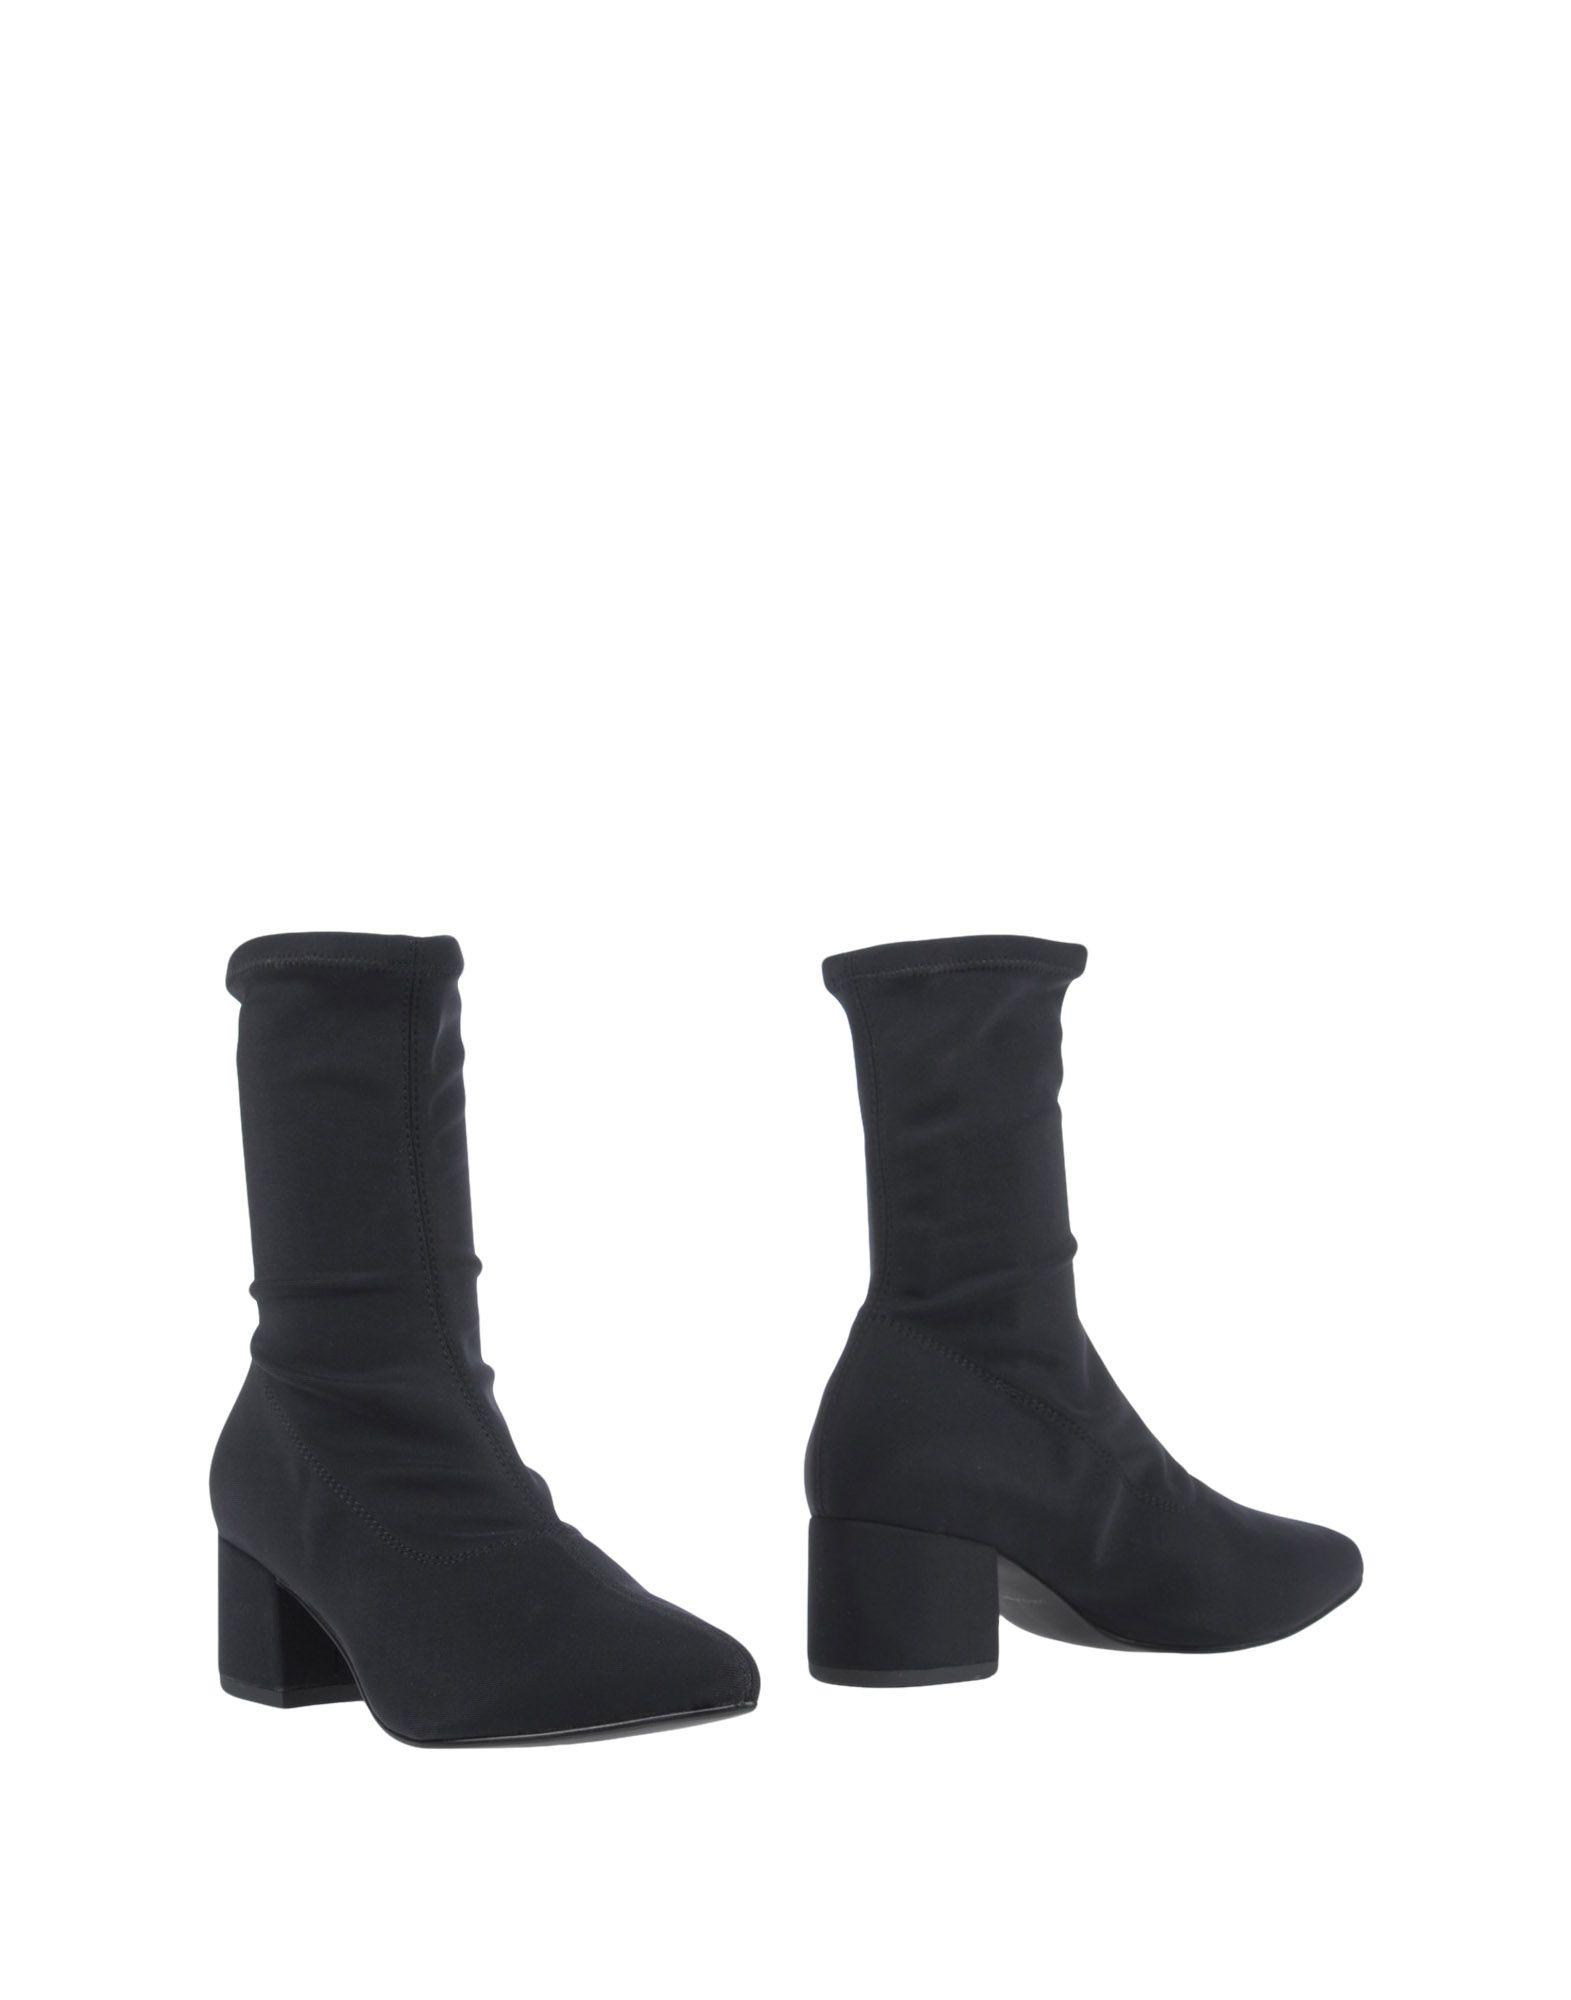 VAGABOND SHOEMAKERS Полусапоги и высокие ботинки vagabond shoemakers полусапоги и высокие ботинки